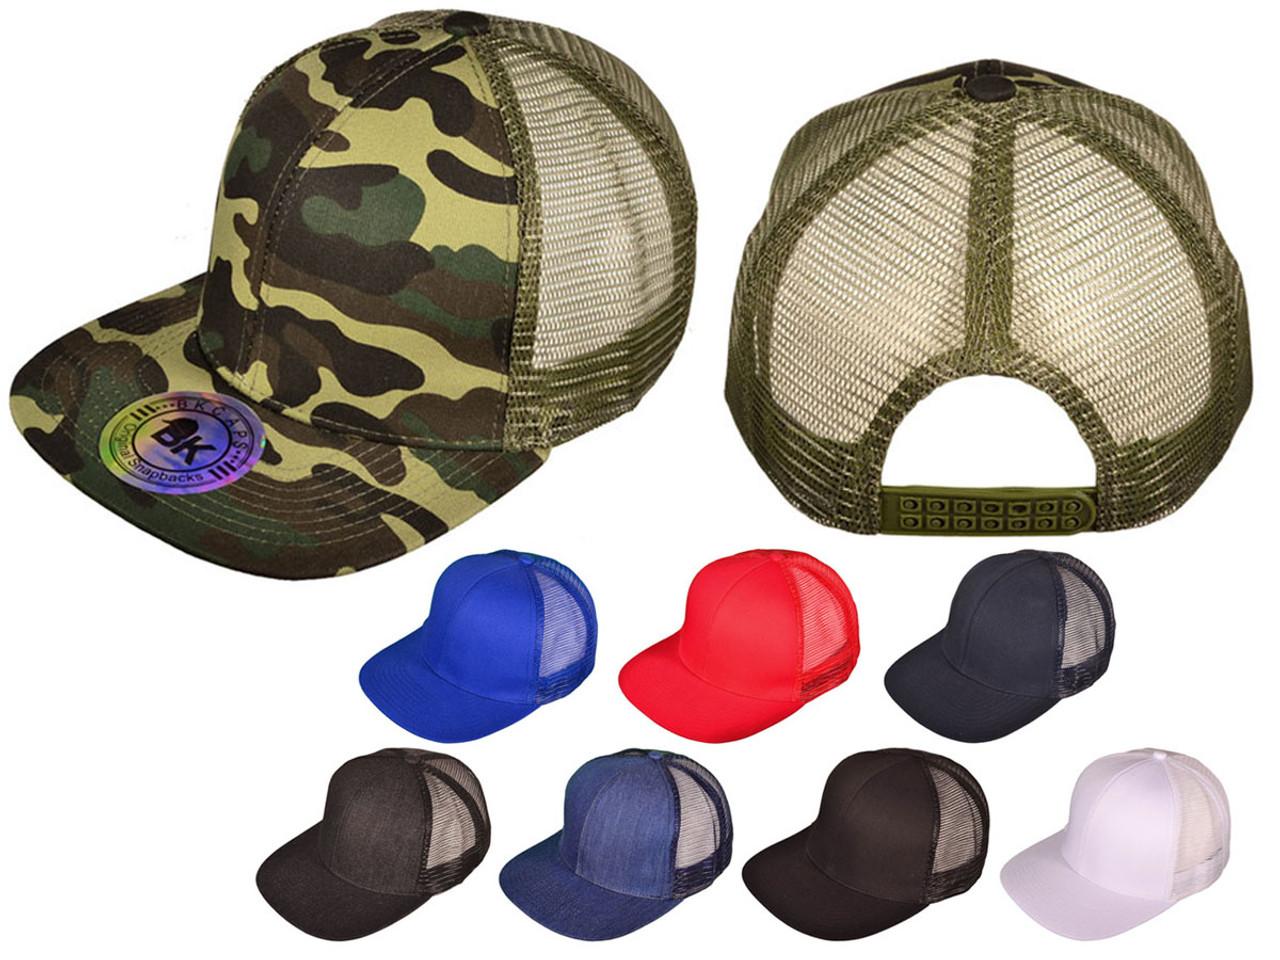 Flat Bill Trucker Hats - BK Caps SnapBack Mesh (8 Colors Available) - 21507